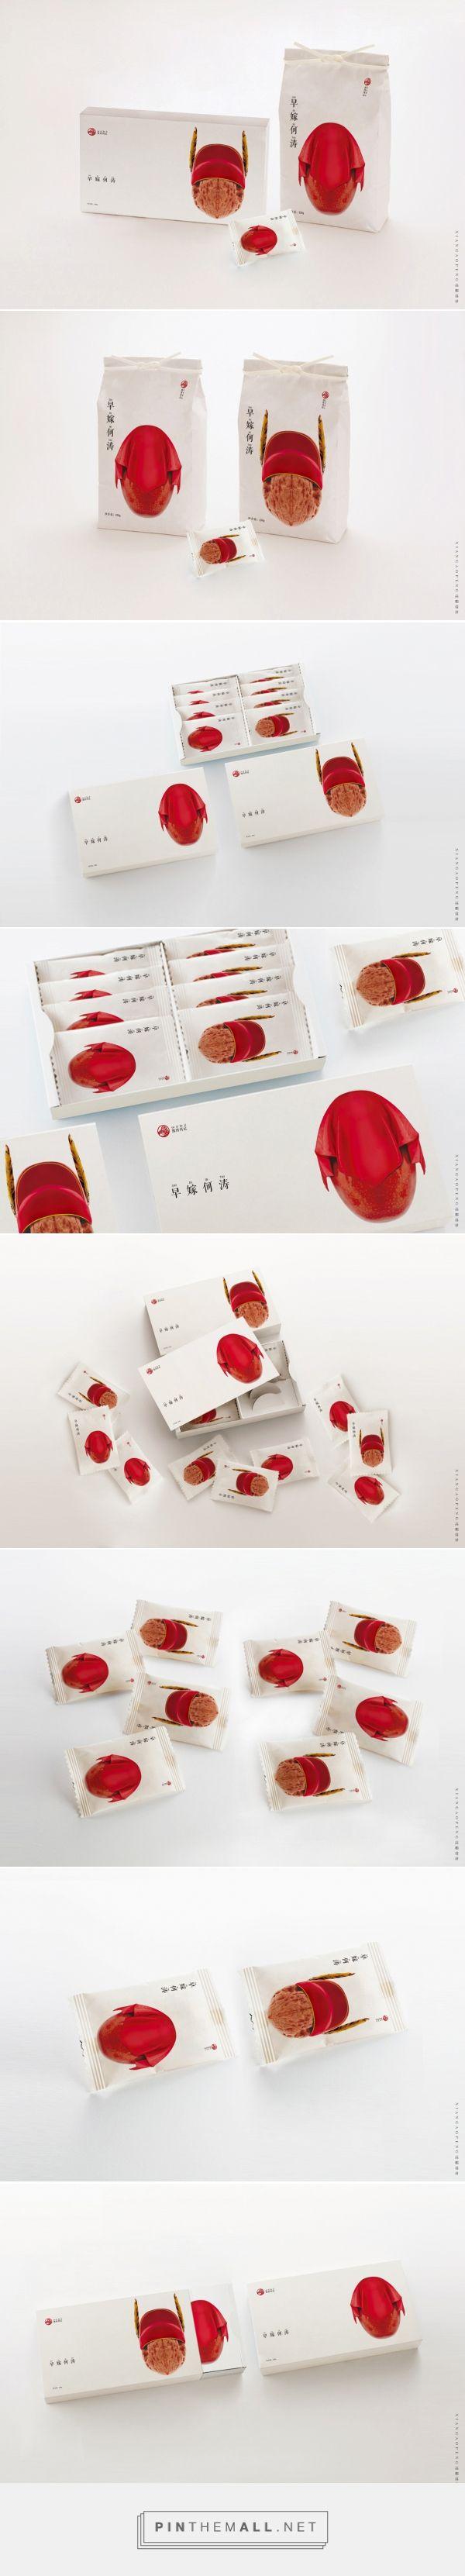 Red Dates & Walnut packaging design by Xian Gao Peng - http://www.packagingoftheworld.com/2017/09/red-dates-walnut.html